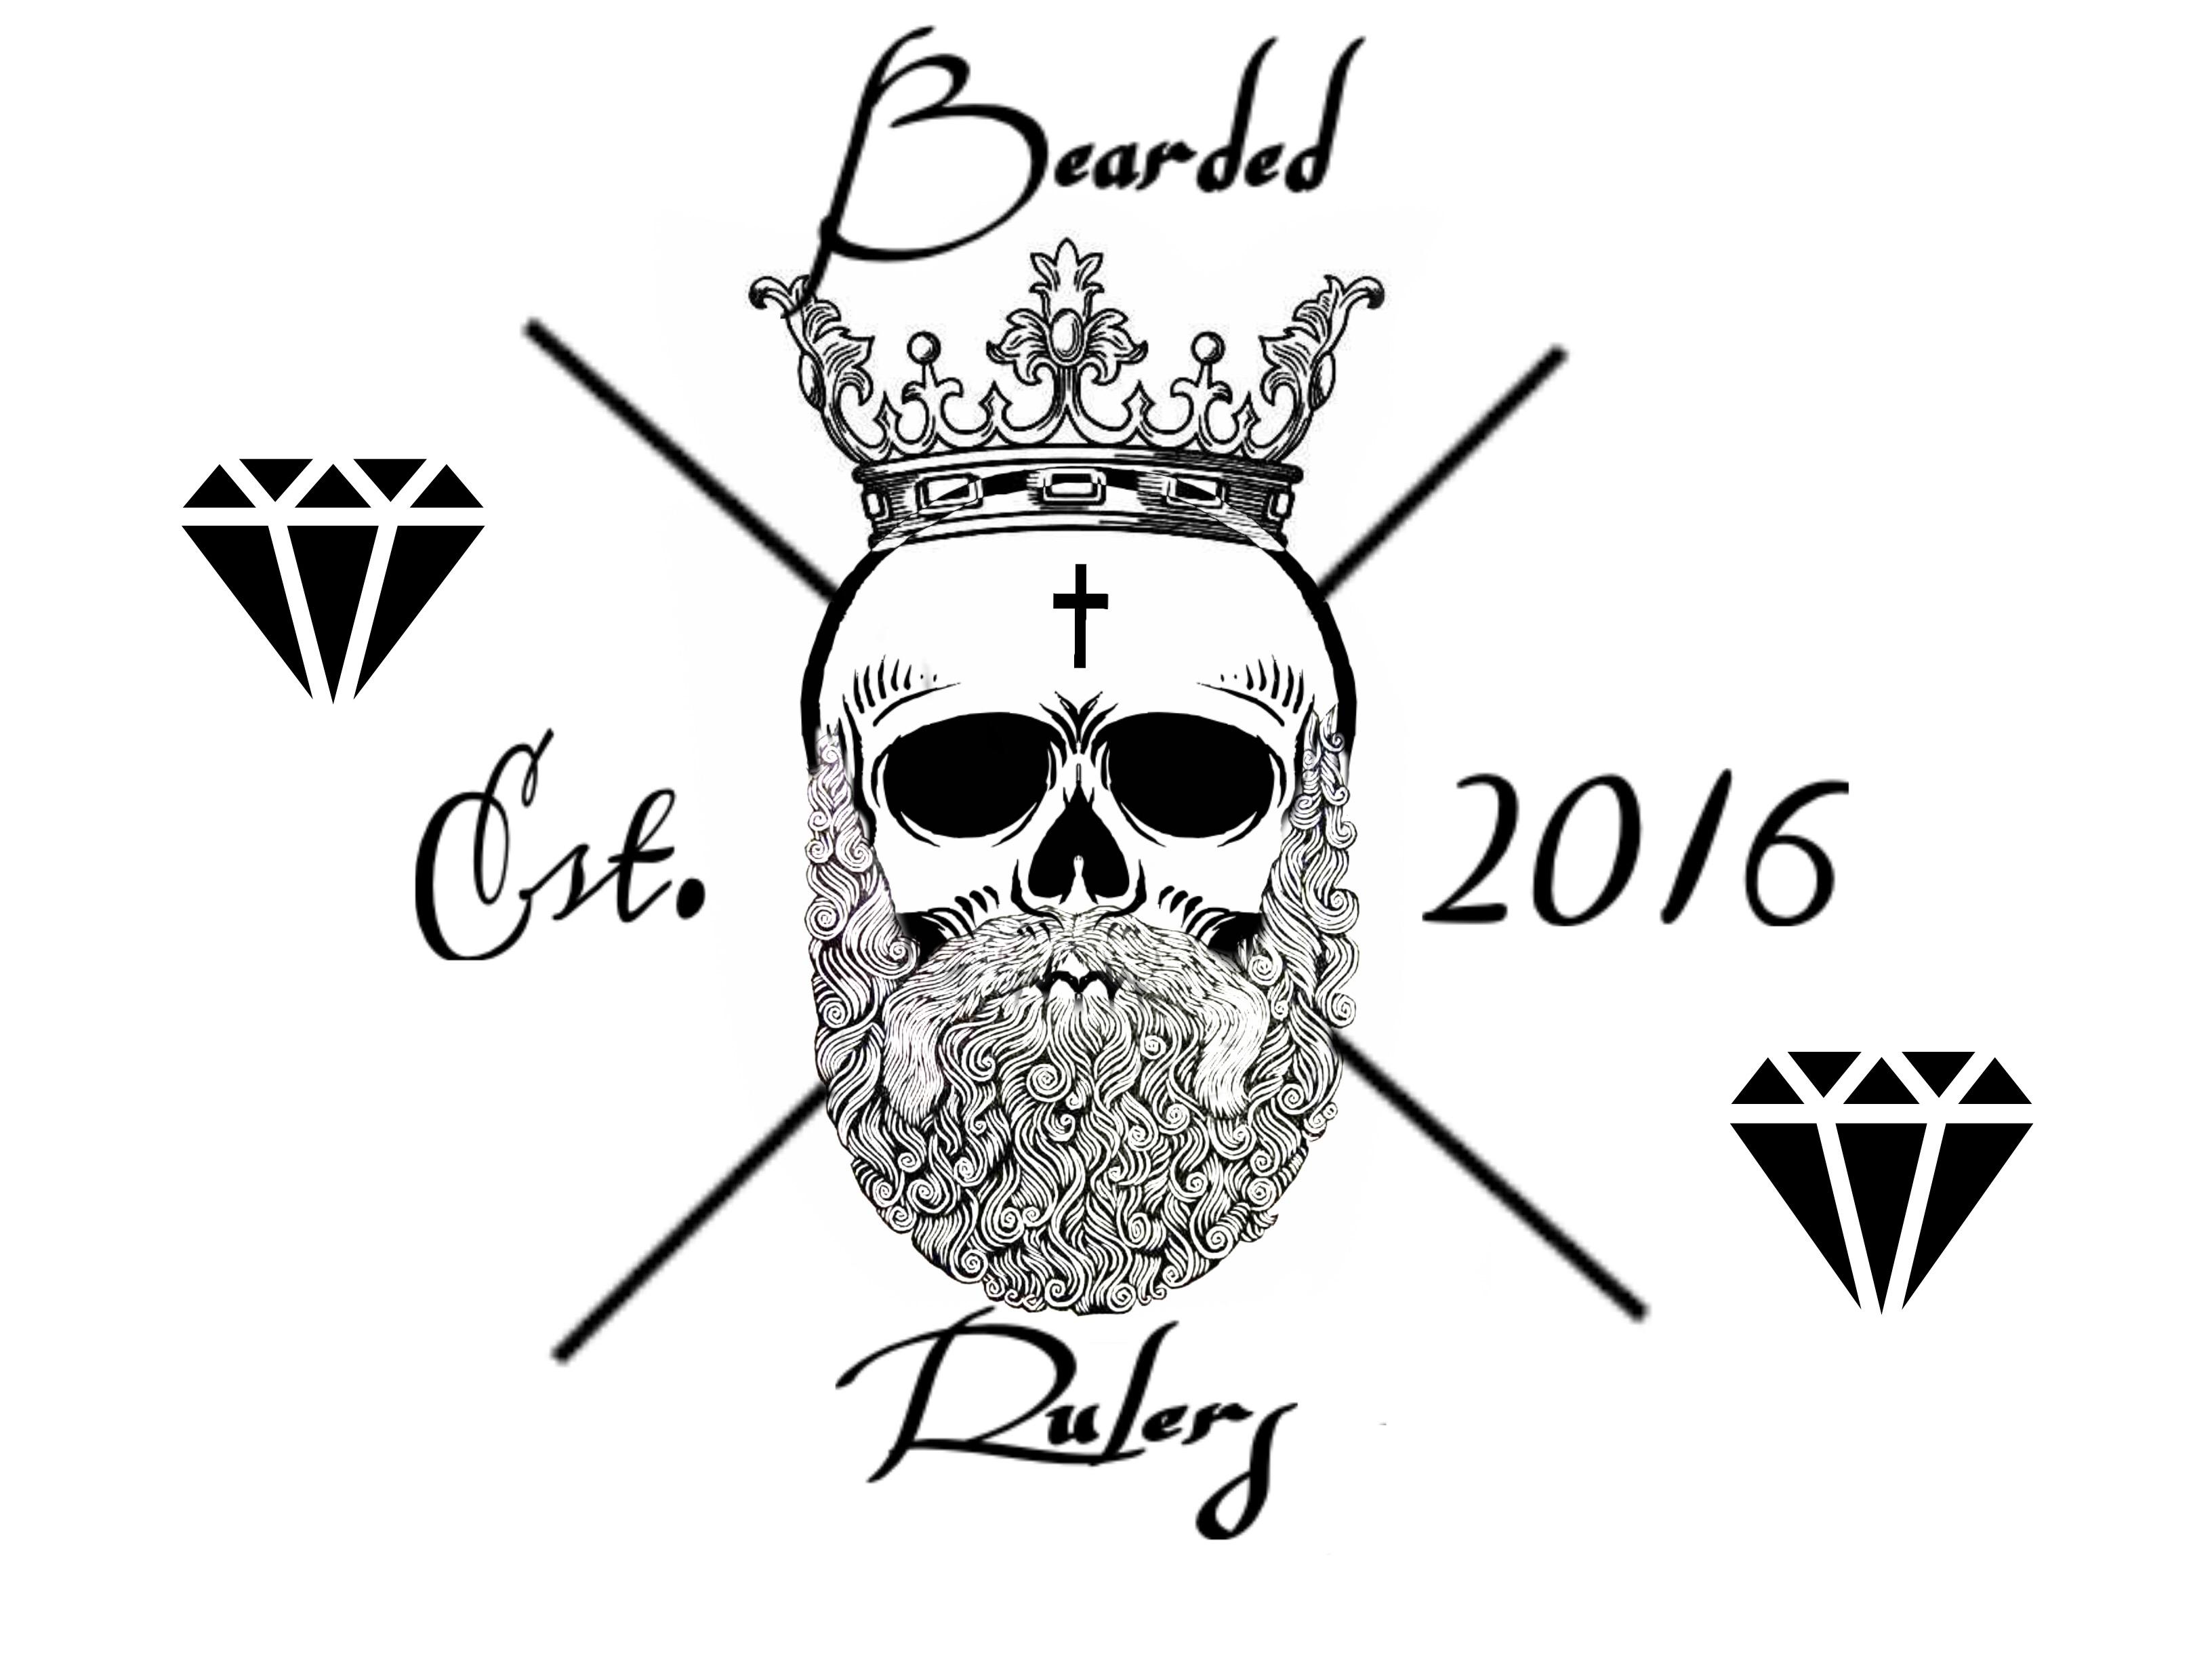 3264x2448 Beardedrulers Beard Skull Crown King Diamonds 2016